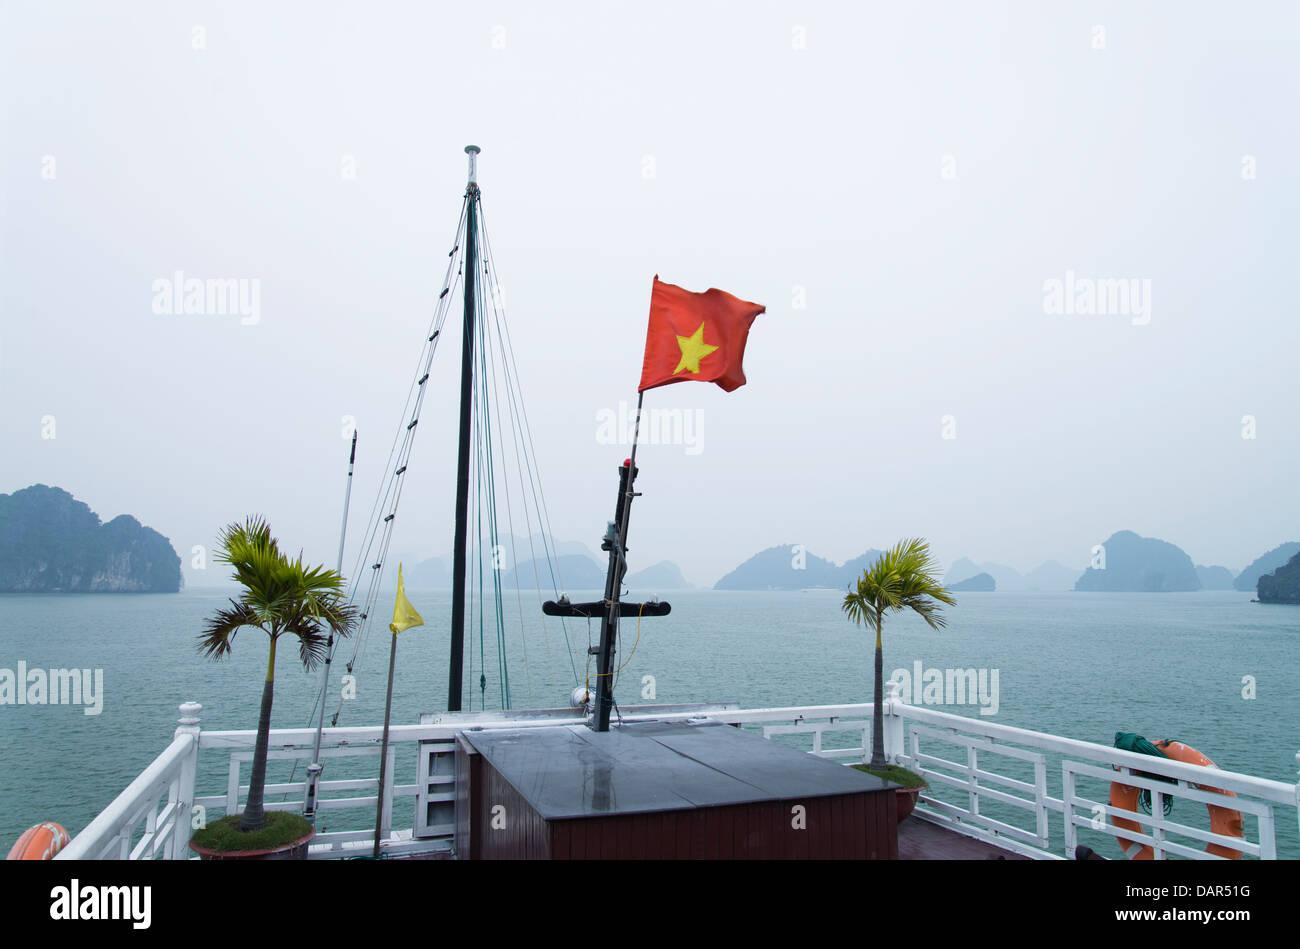 Halong Bay Cruising - Stock Image